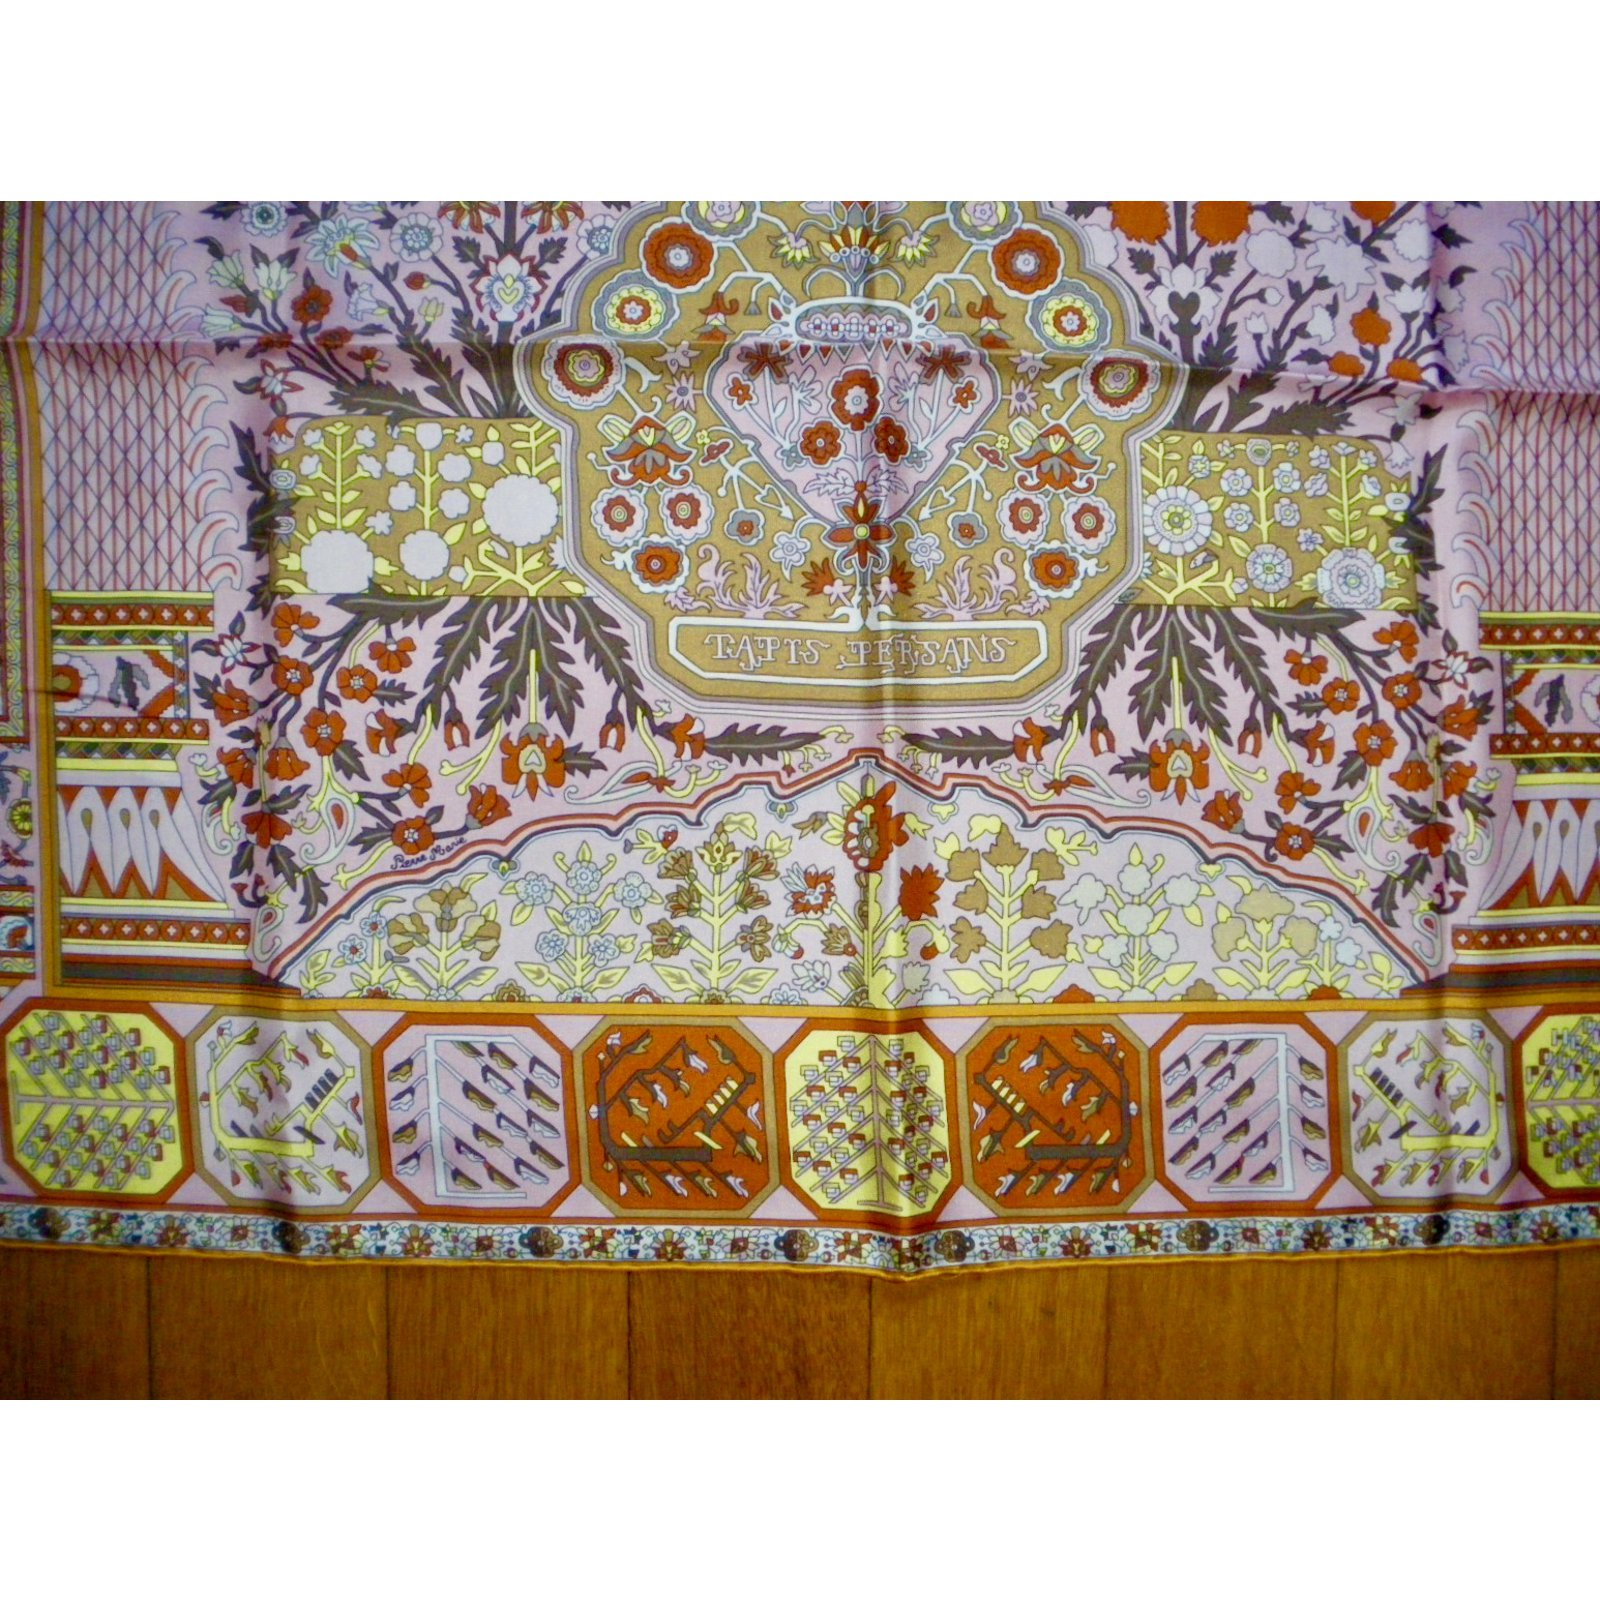 carr s herm s tapis persans soie multicolore joli closet. Black Bedroom Furniture Sets. Home Design Ideas